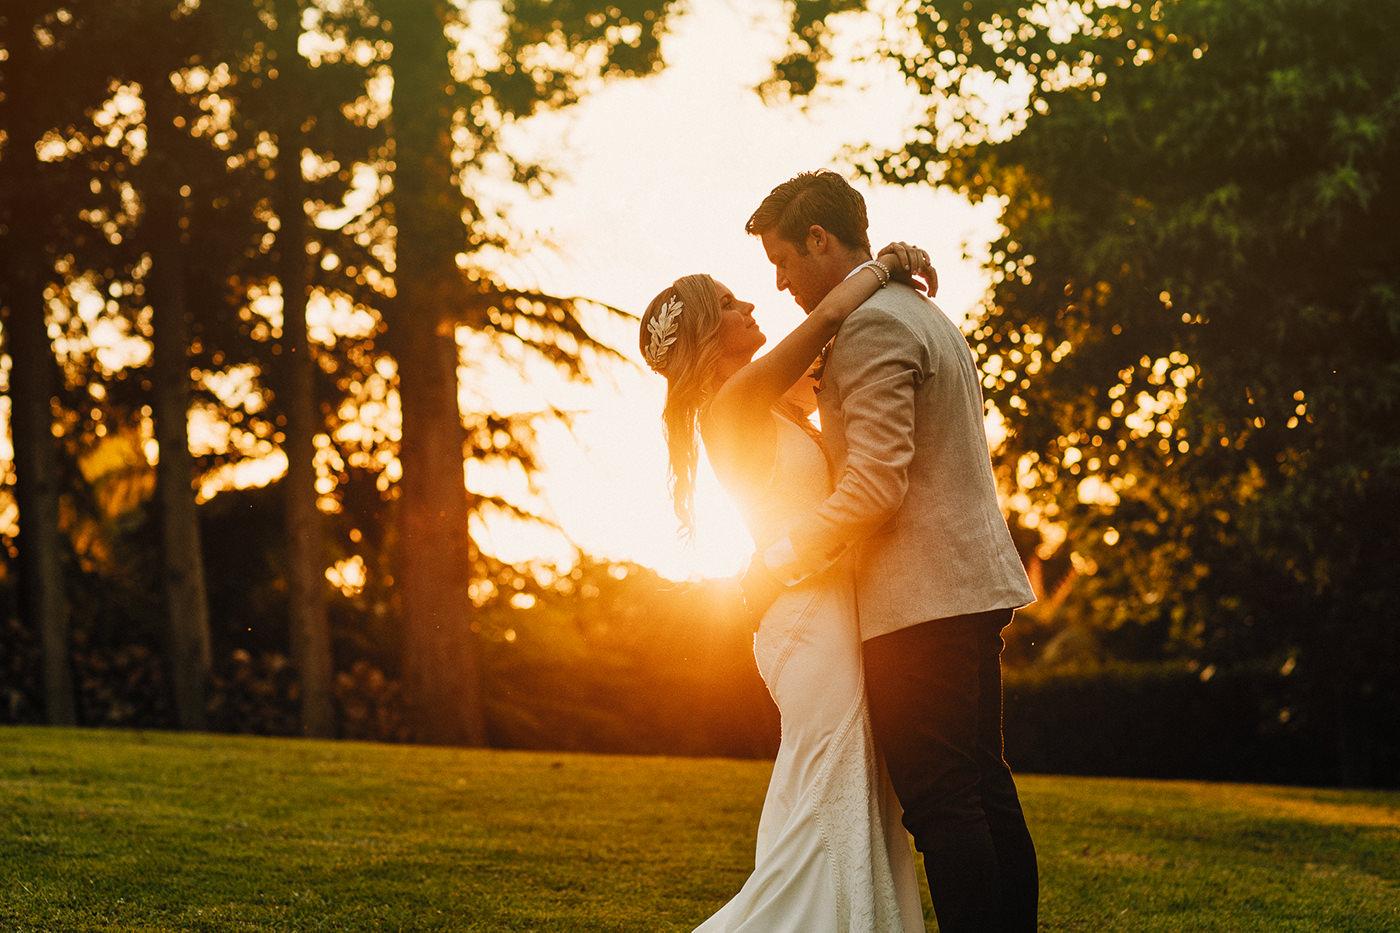 wedding_photographer_nz-00029.jpg